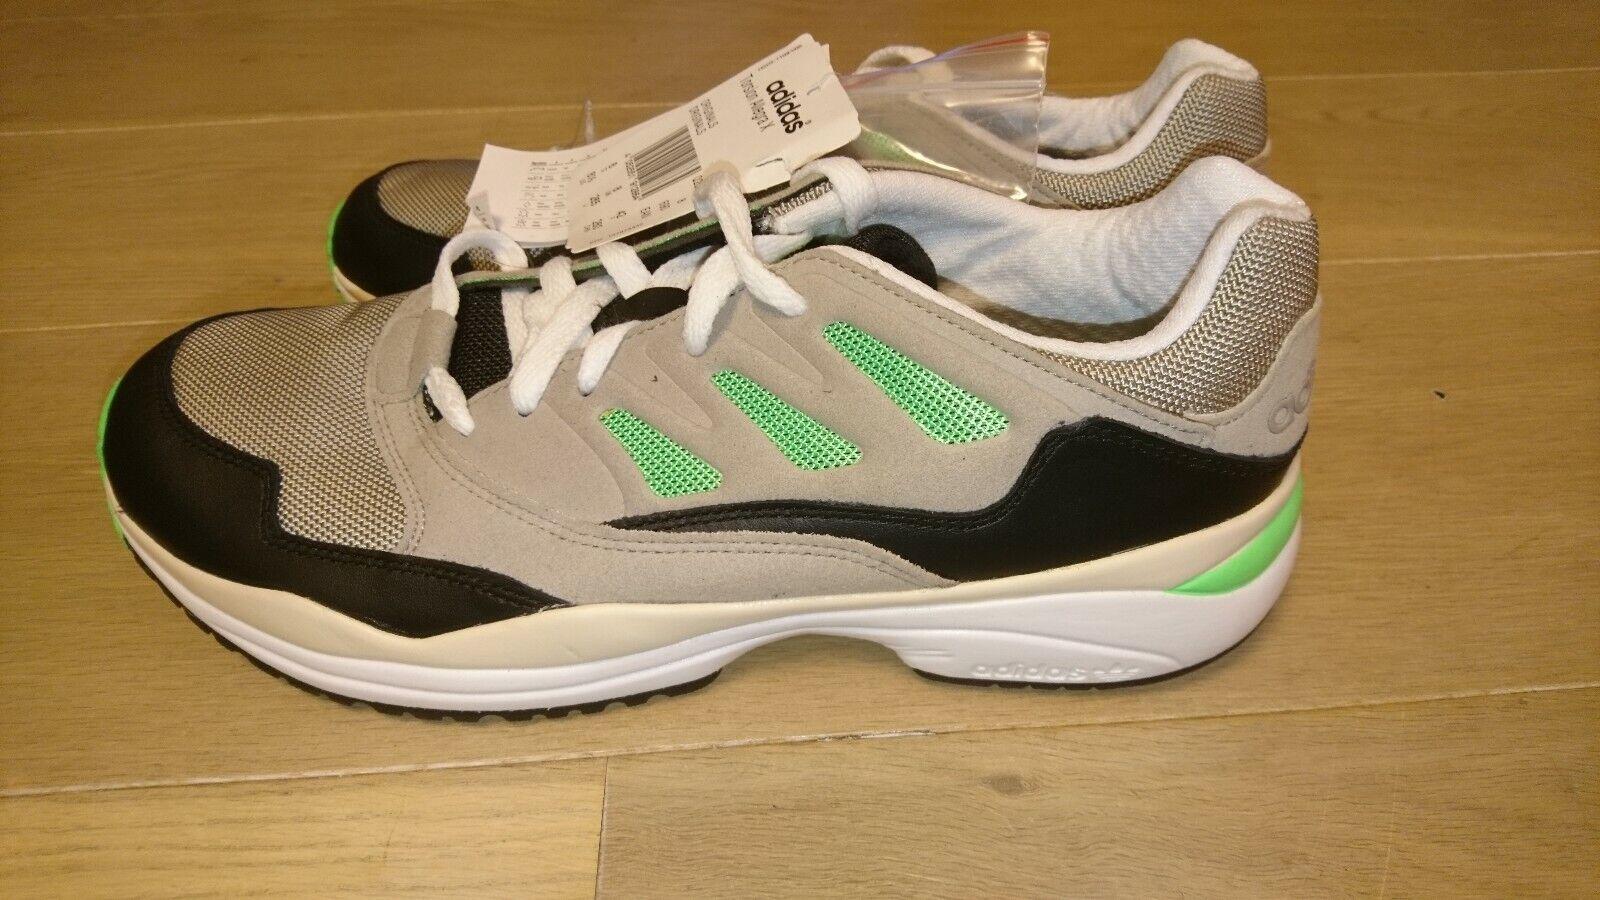 Adidas Torsion Allegra X Gr. 42 Q20339